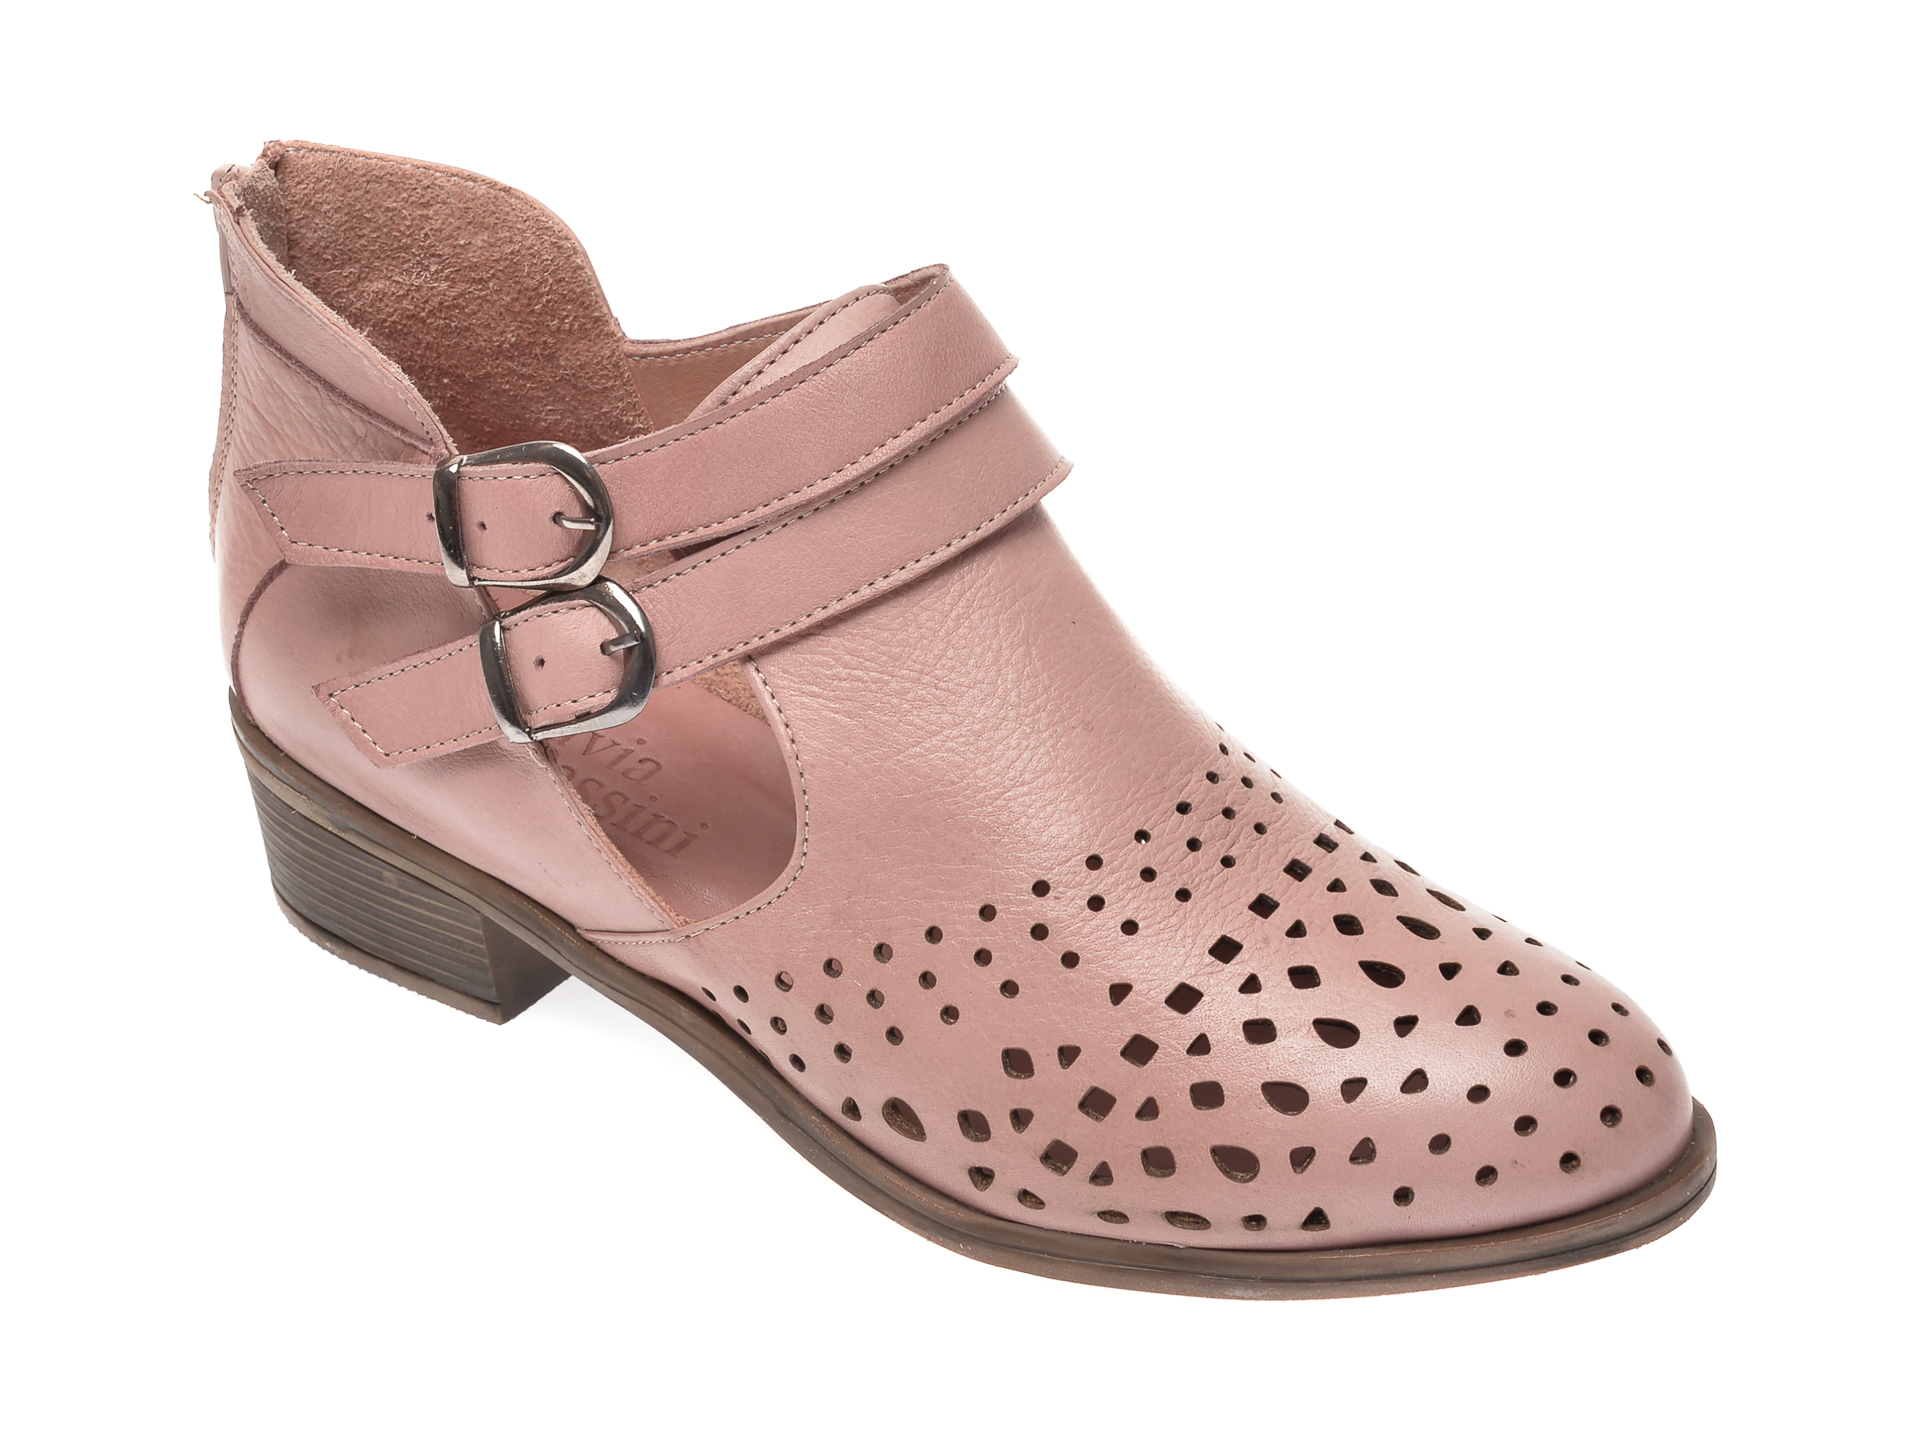 Pantofi FLAVIA PASSINI roz, B004, din piele naturala imagine